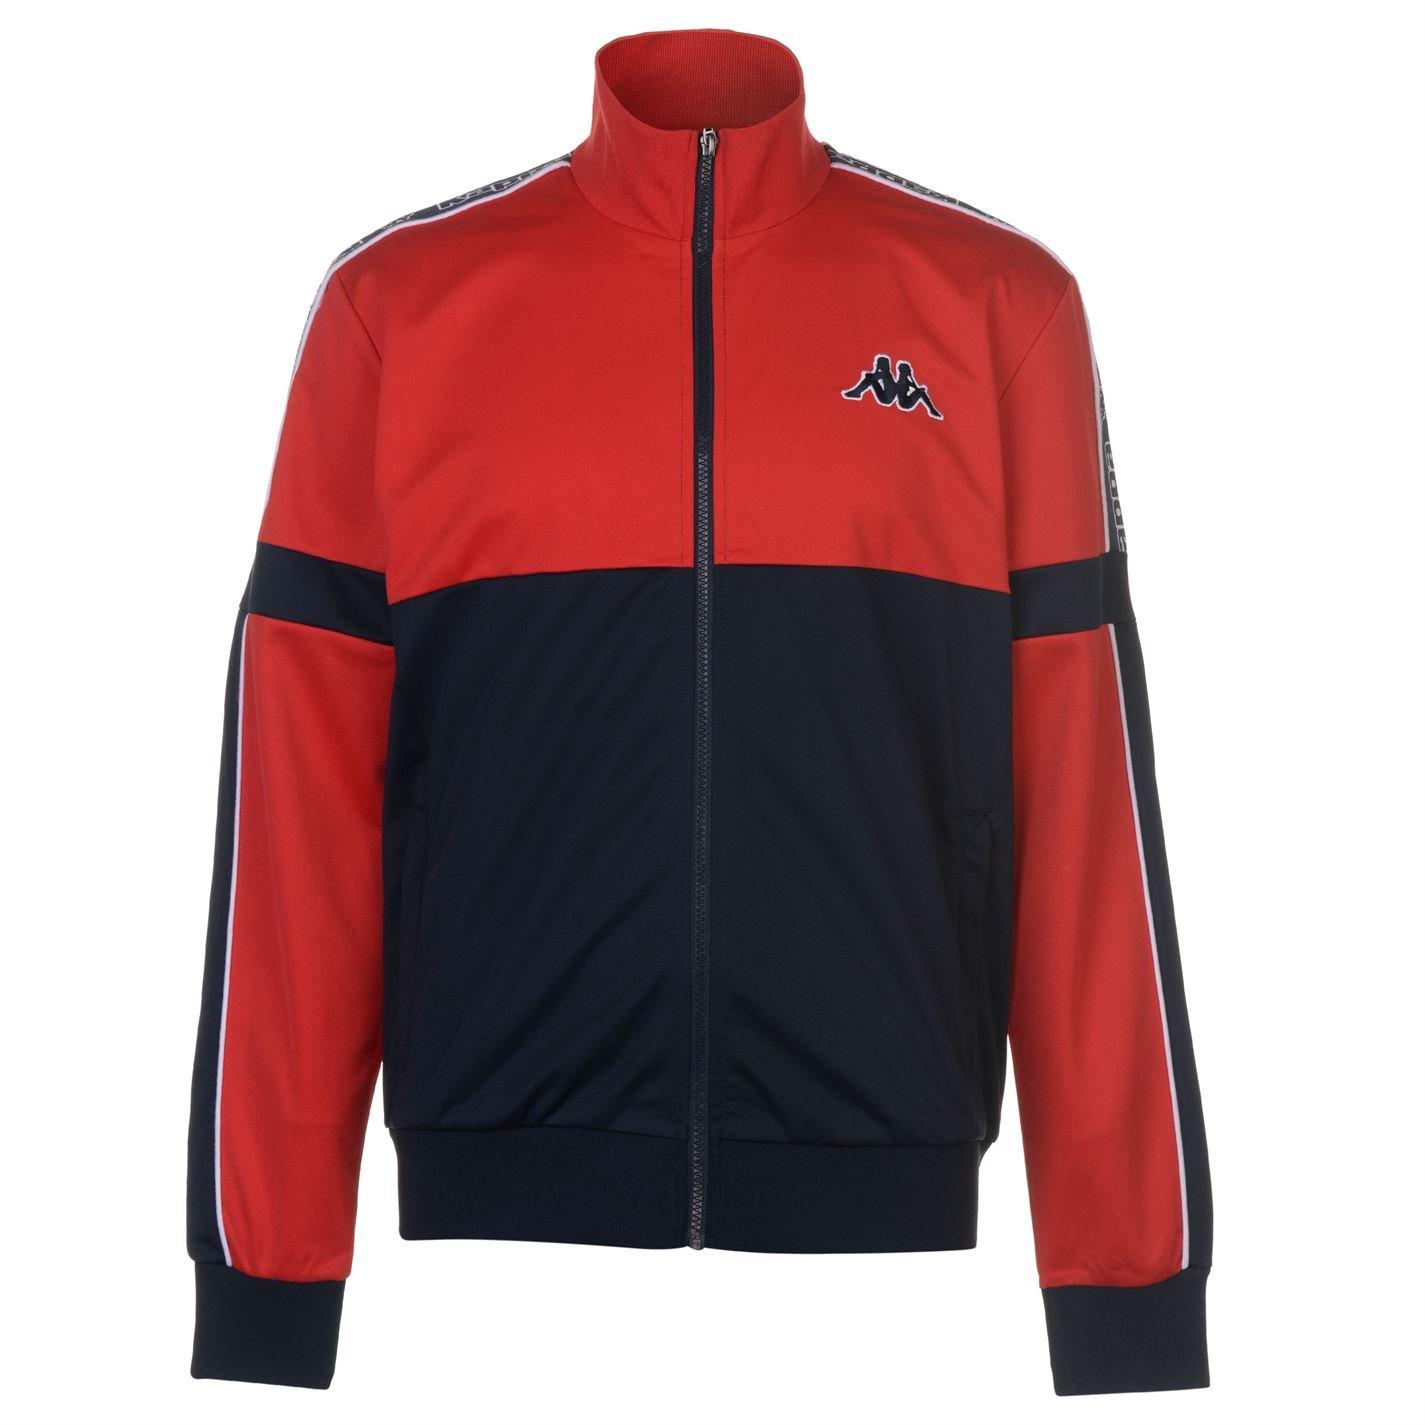 Kappa Mens Panel Jacket Tracksuit Top Coat Long Sleeve Zip Full Block Colour Red Extra LGE